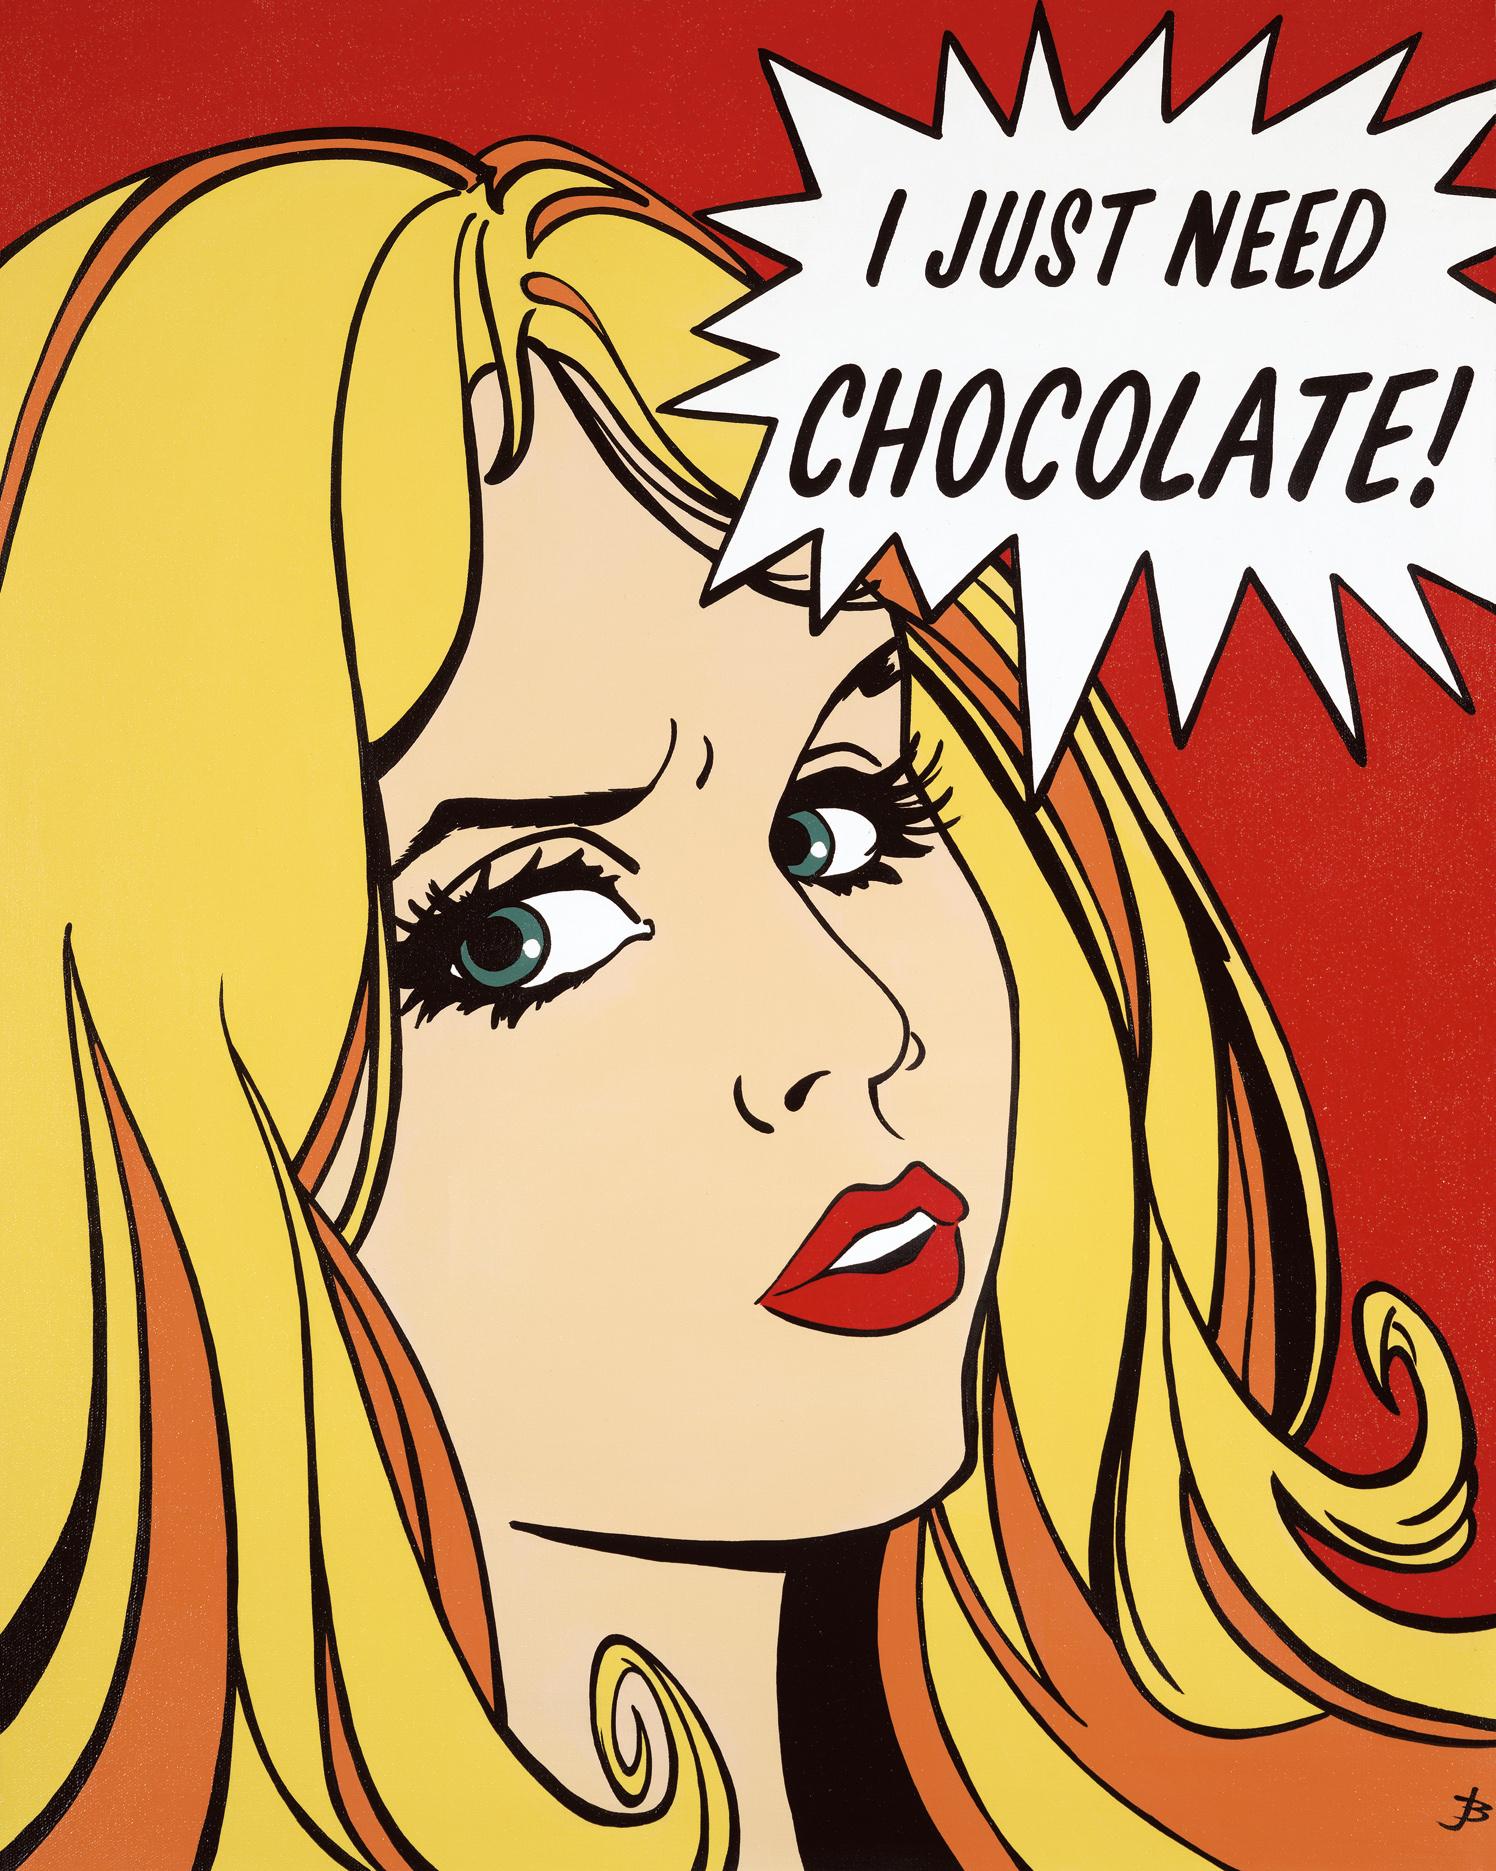 I Just Need Chocolate